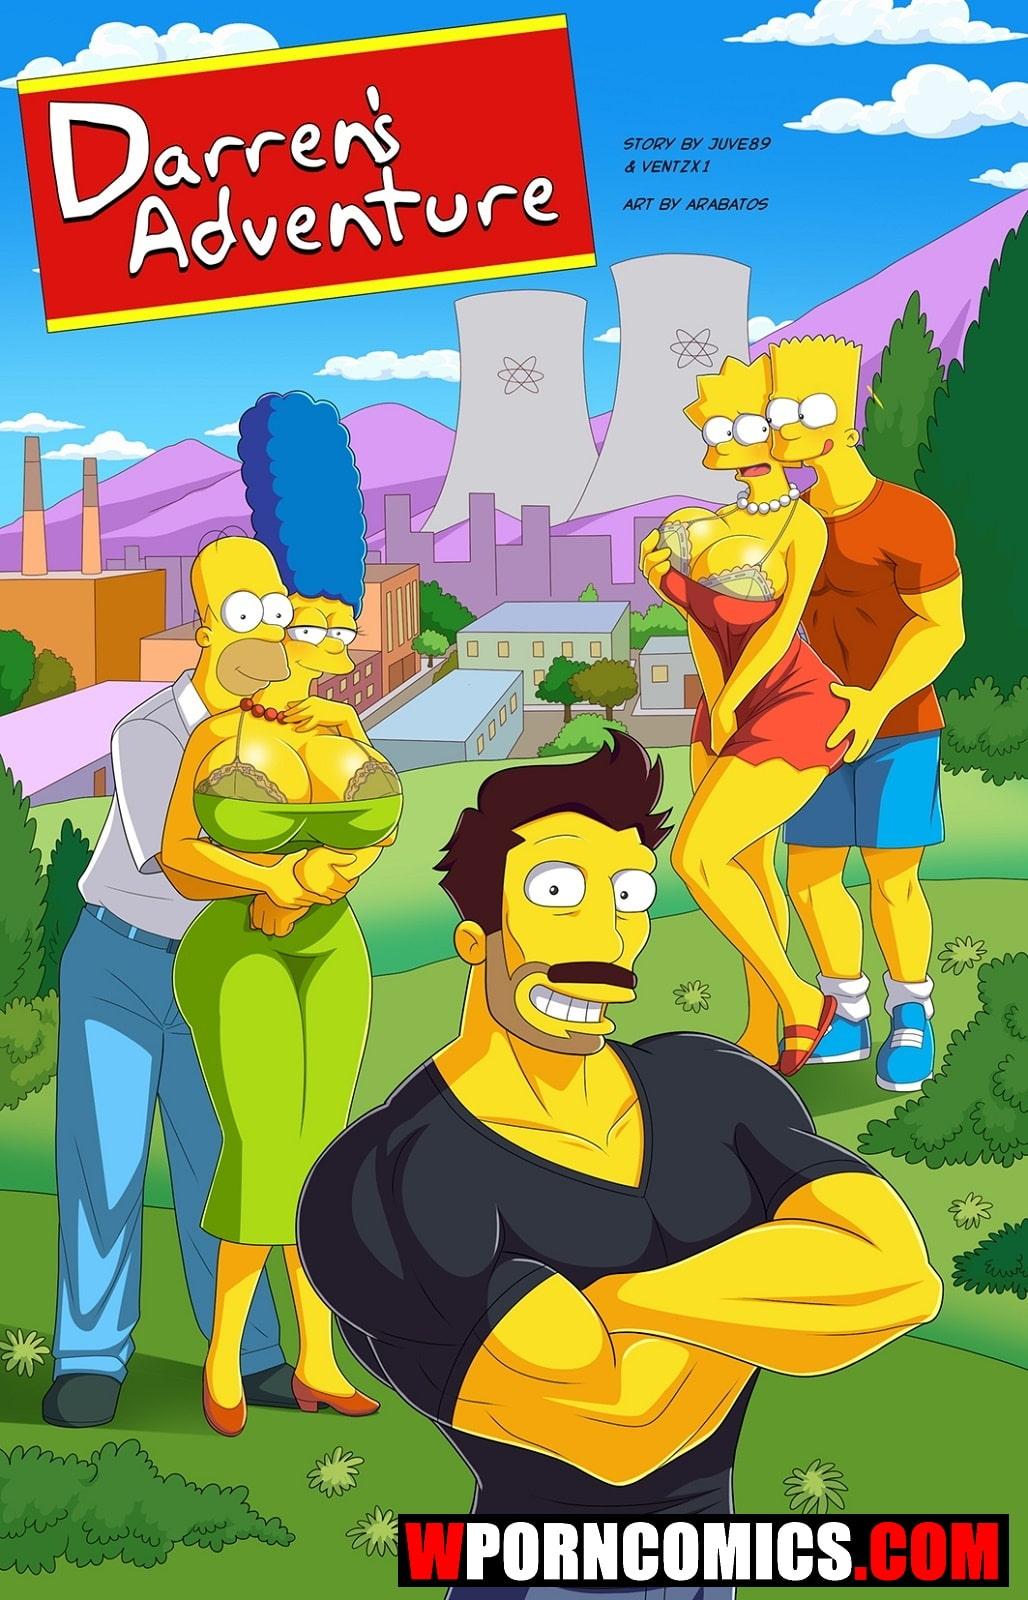 Porn comic Simpsons. Darrens Adventure. Part 4.